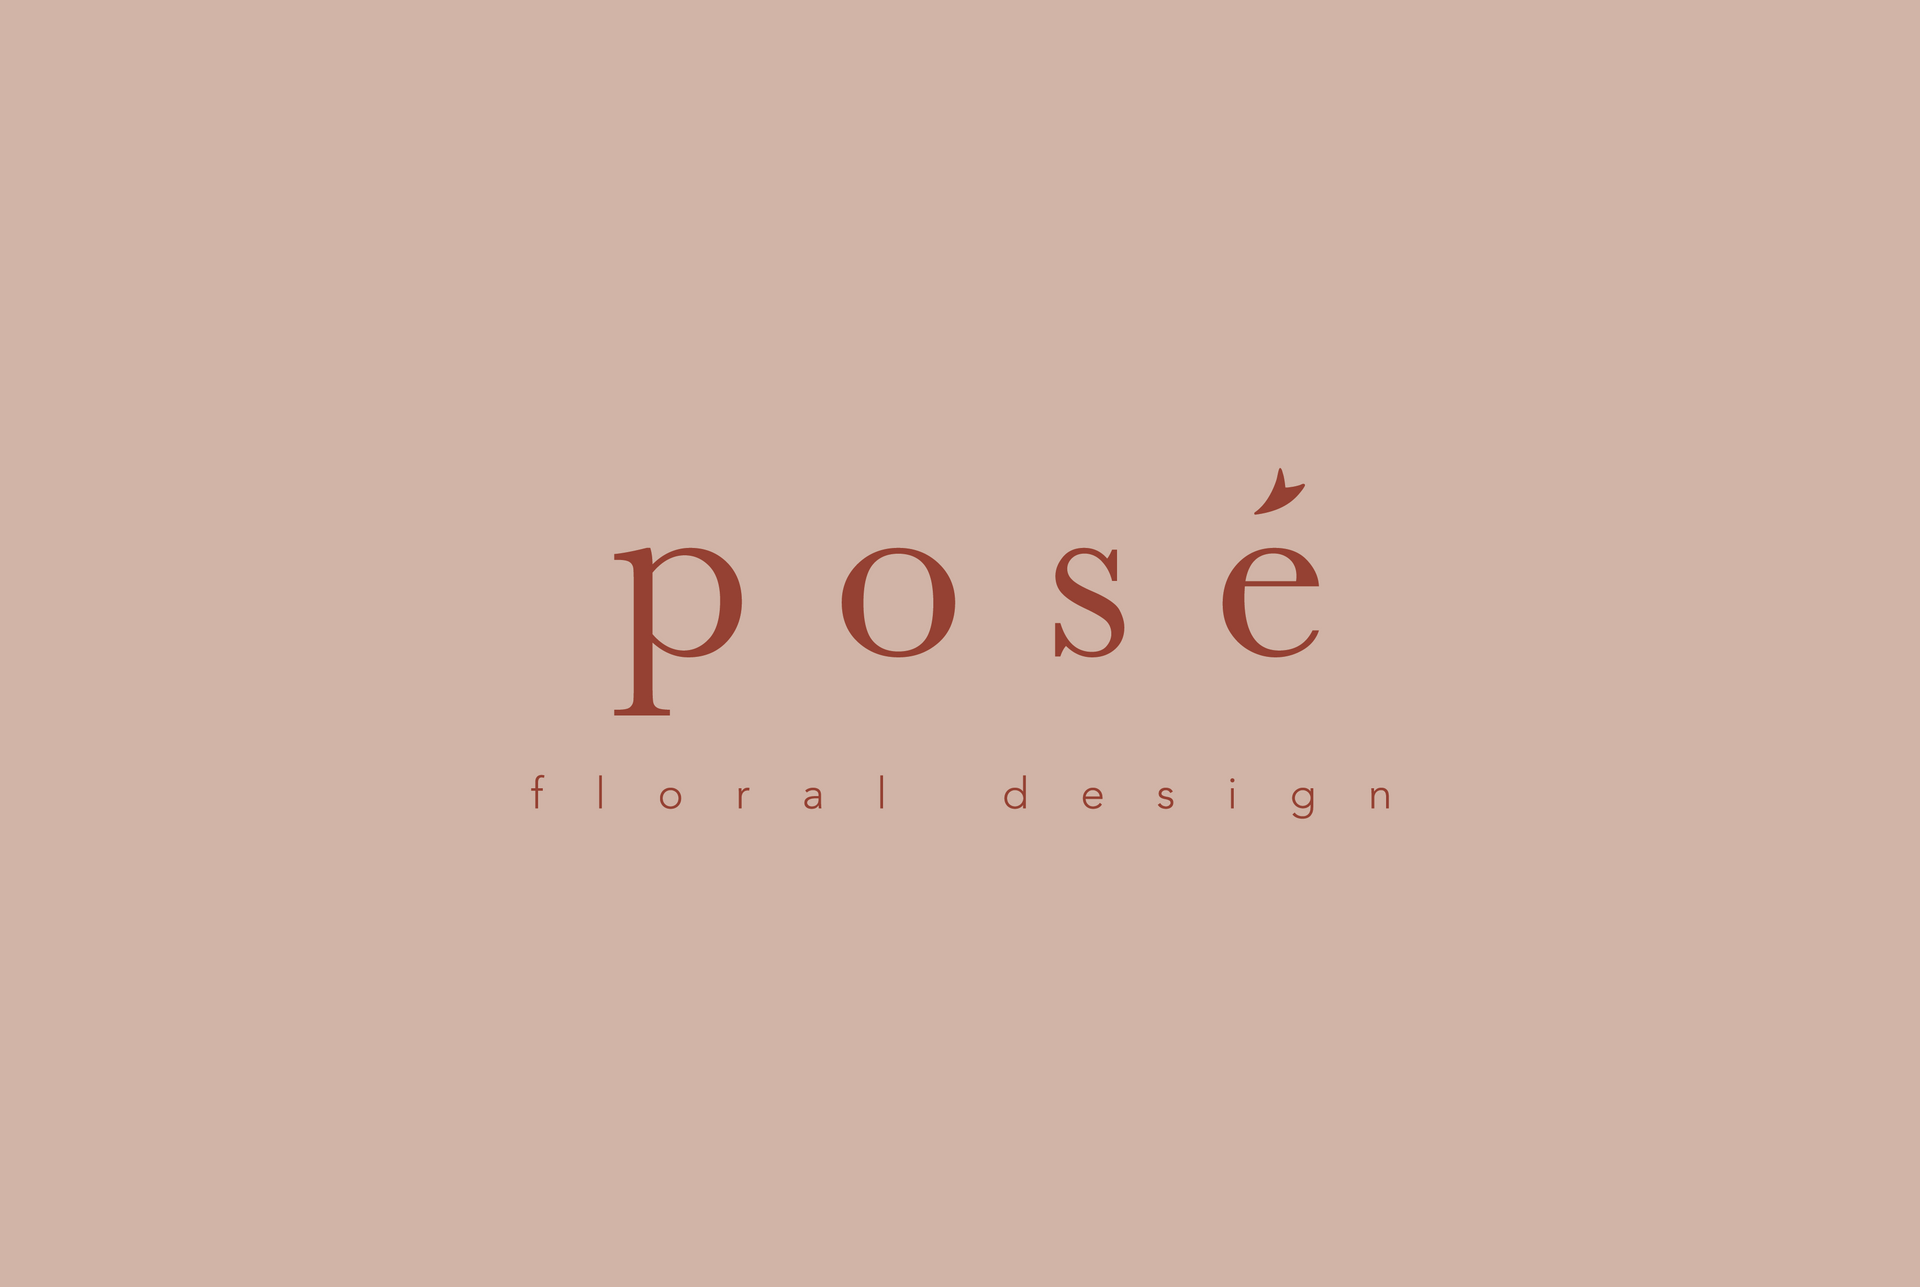 Pose Flowers Branding | Brand Identity Design by Fresh Leaf Creative | Dorset Brand Designer & Photographer